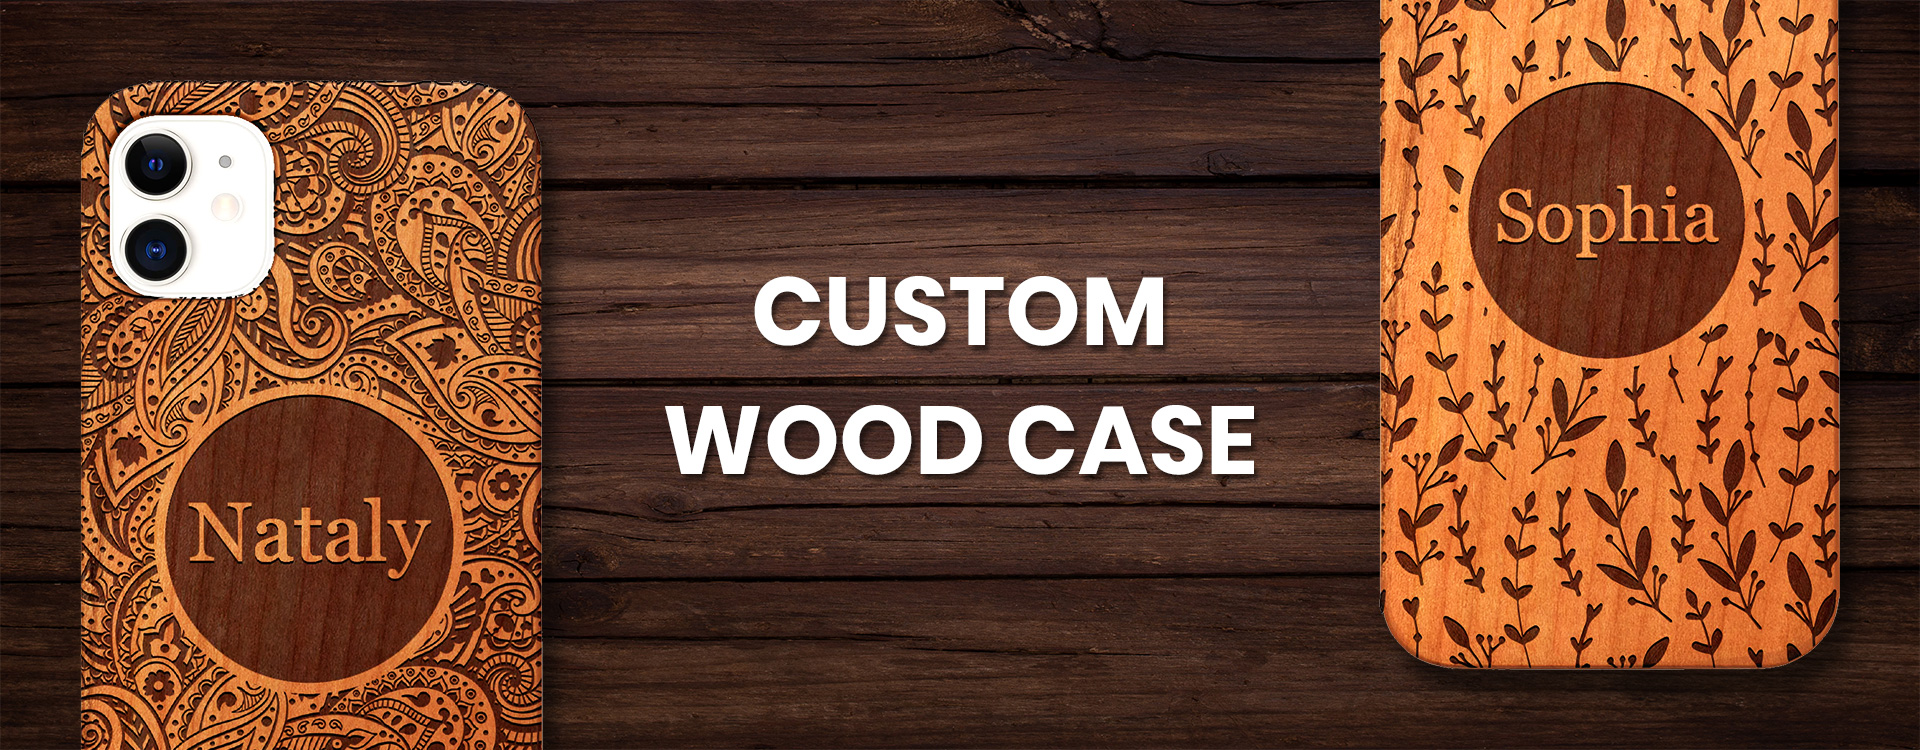 Custom Wood case